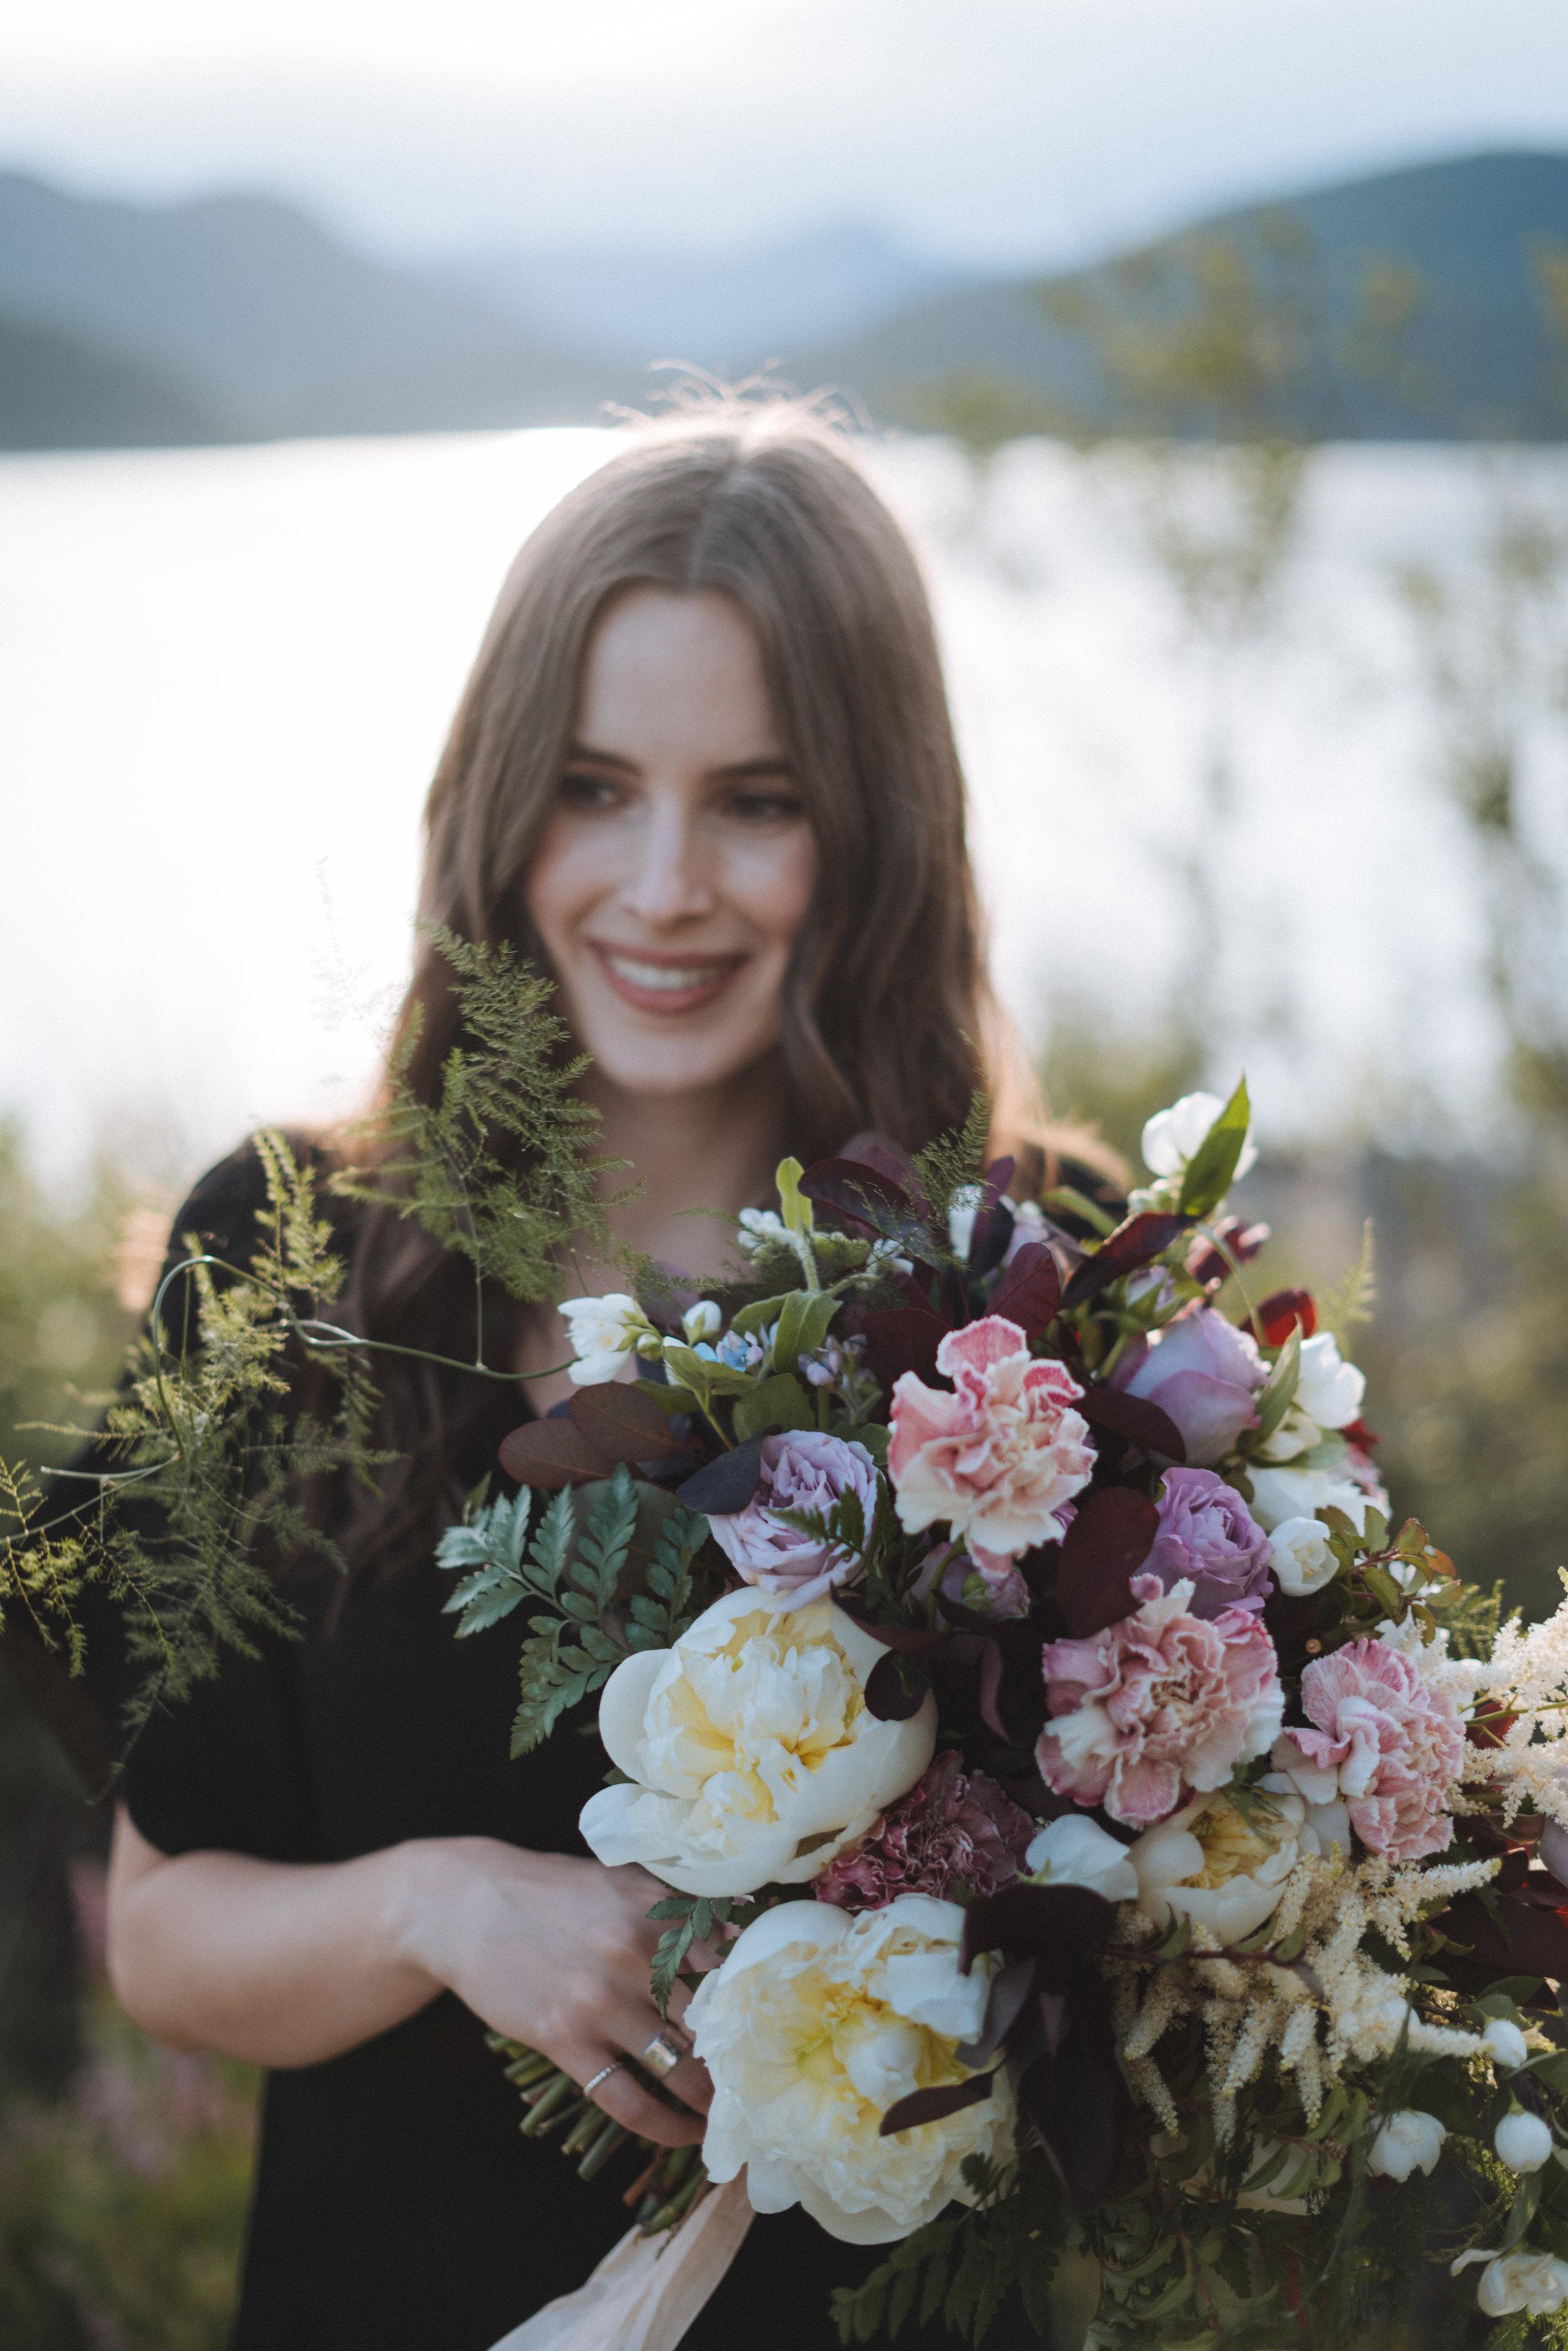 Vancouver-Canada-Travel-Elopement-Adventure-Wedding-Portrait-Photographer-Emma-Rae16.jpg